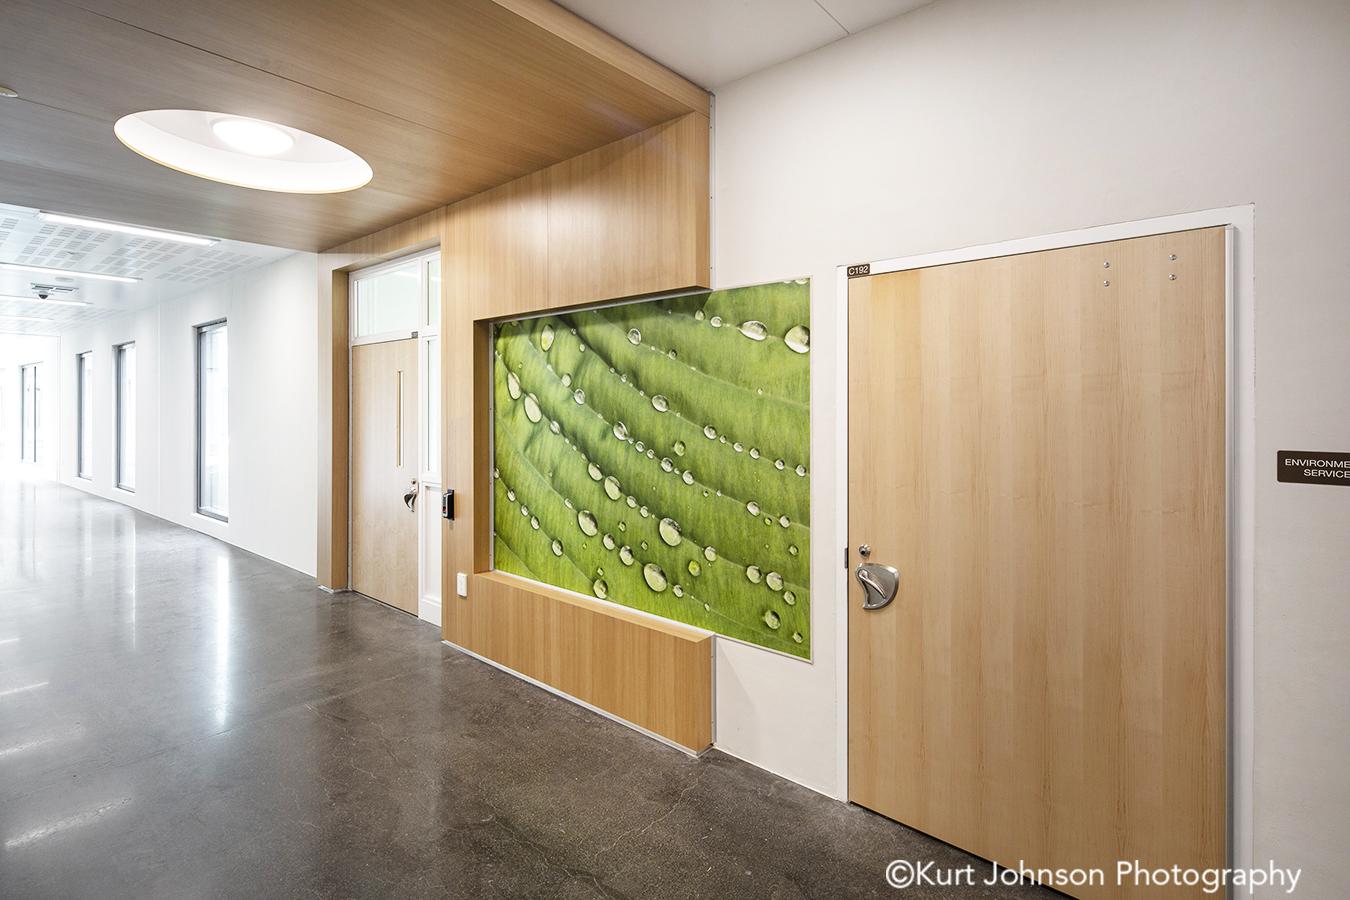 fulton state hospital missouri mo behavioral health Koroseal fusion wall protection green leaf leaves water corridor hallway wayfinding art install installation